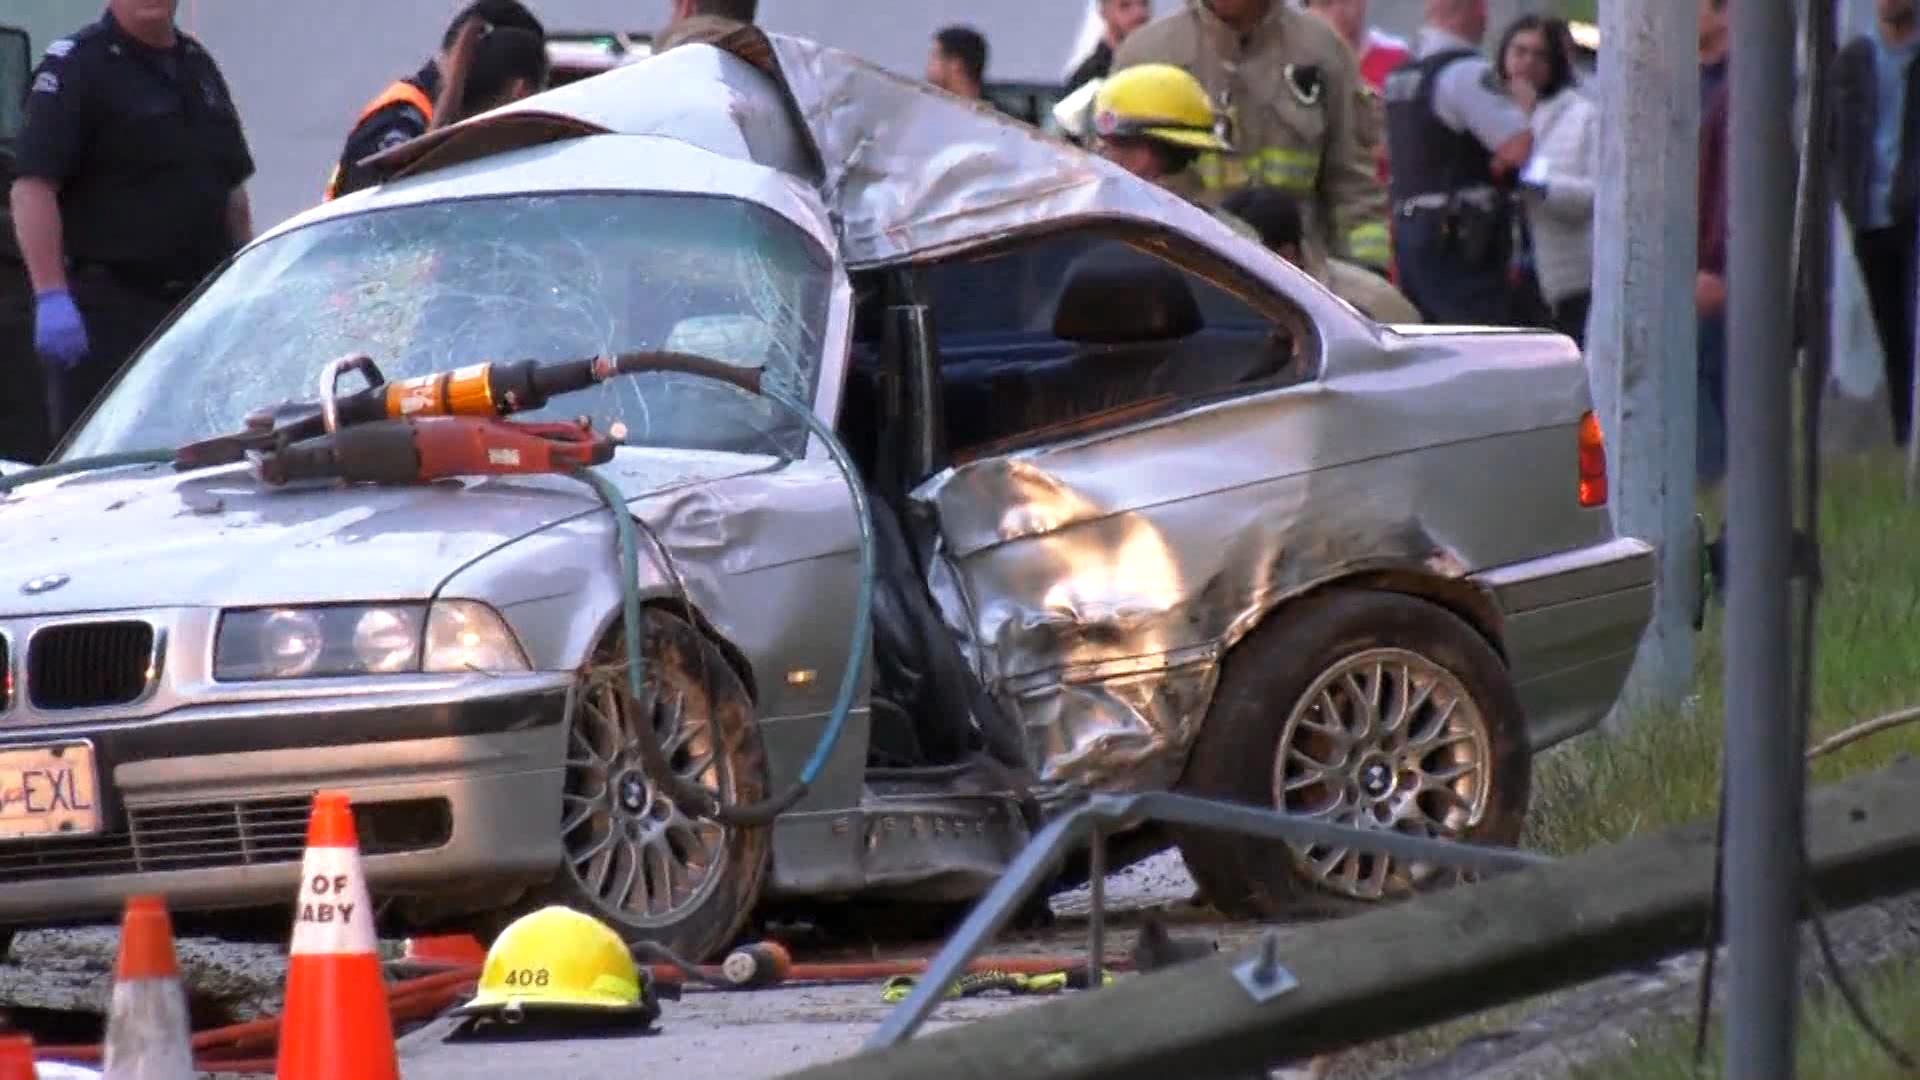 Pedestrian killed in Burnaby crash | CTV News